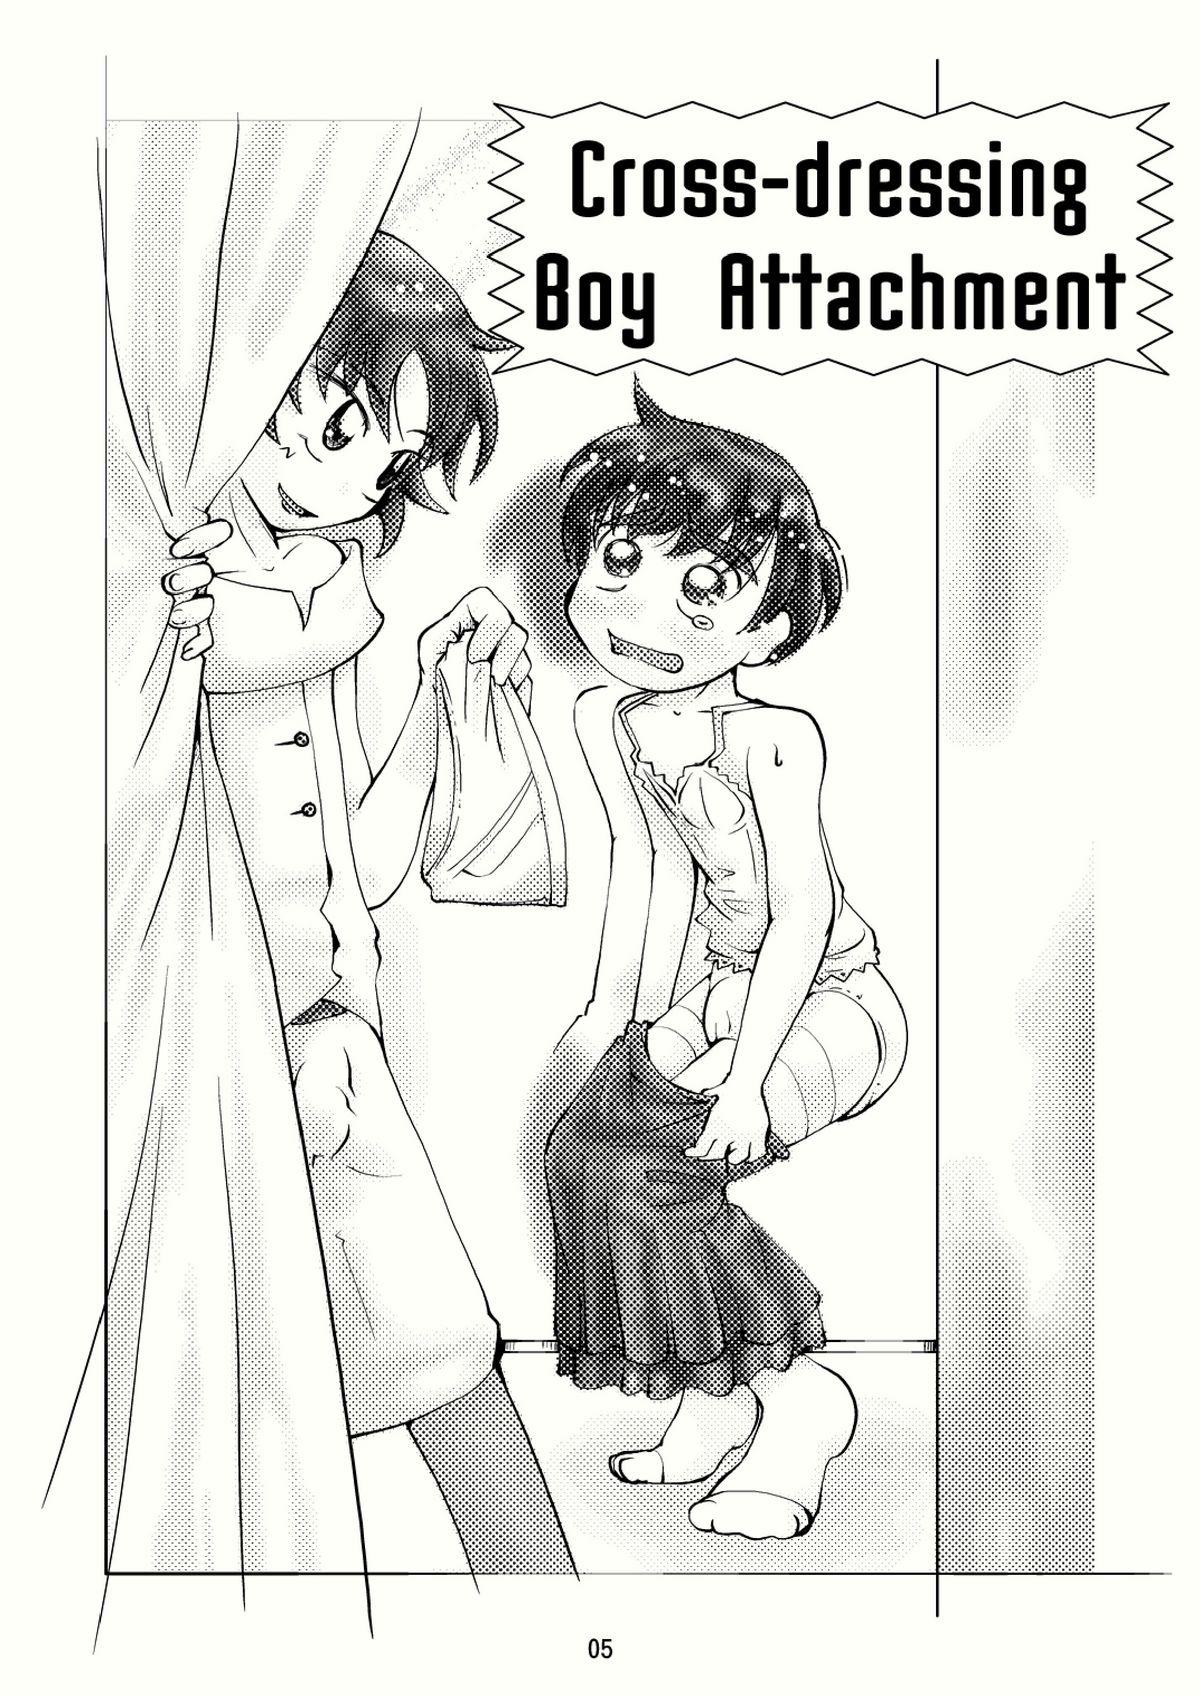 Crossdressing Boys Assemblage 3